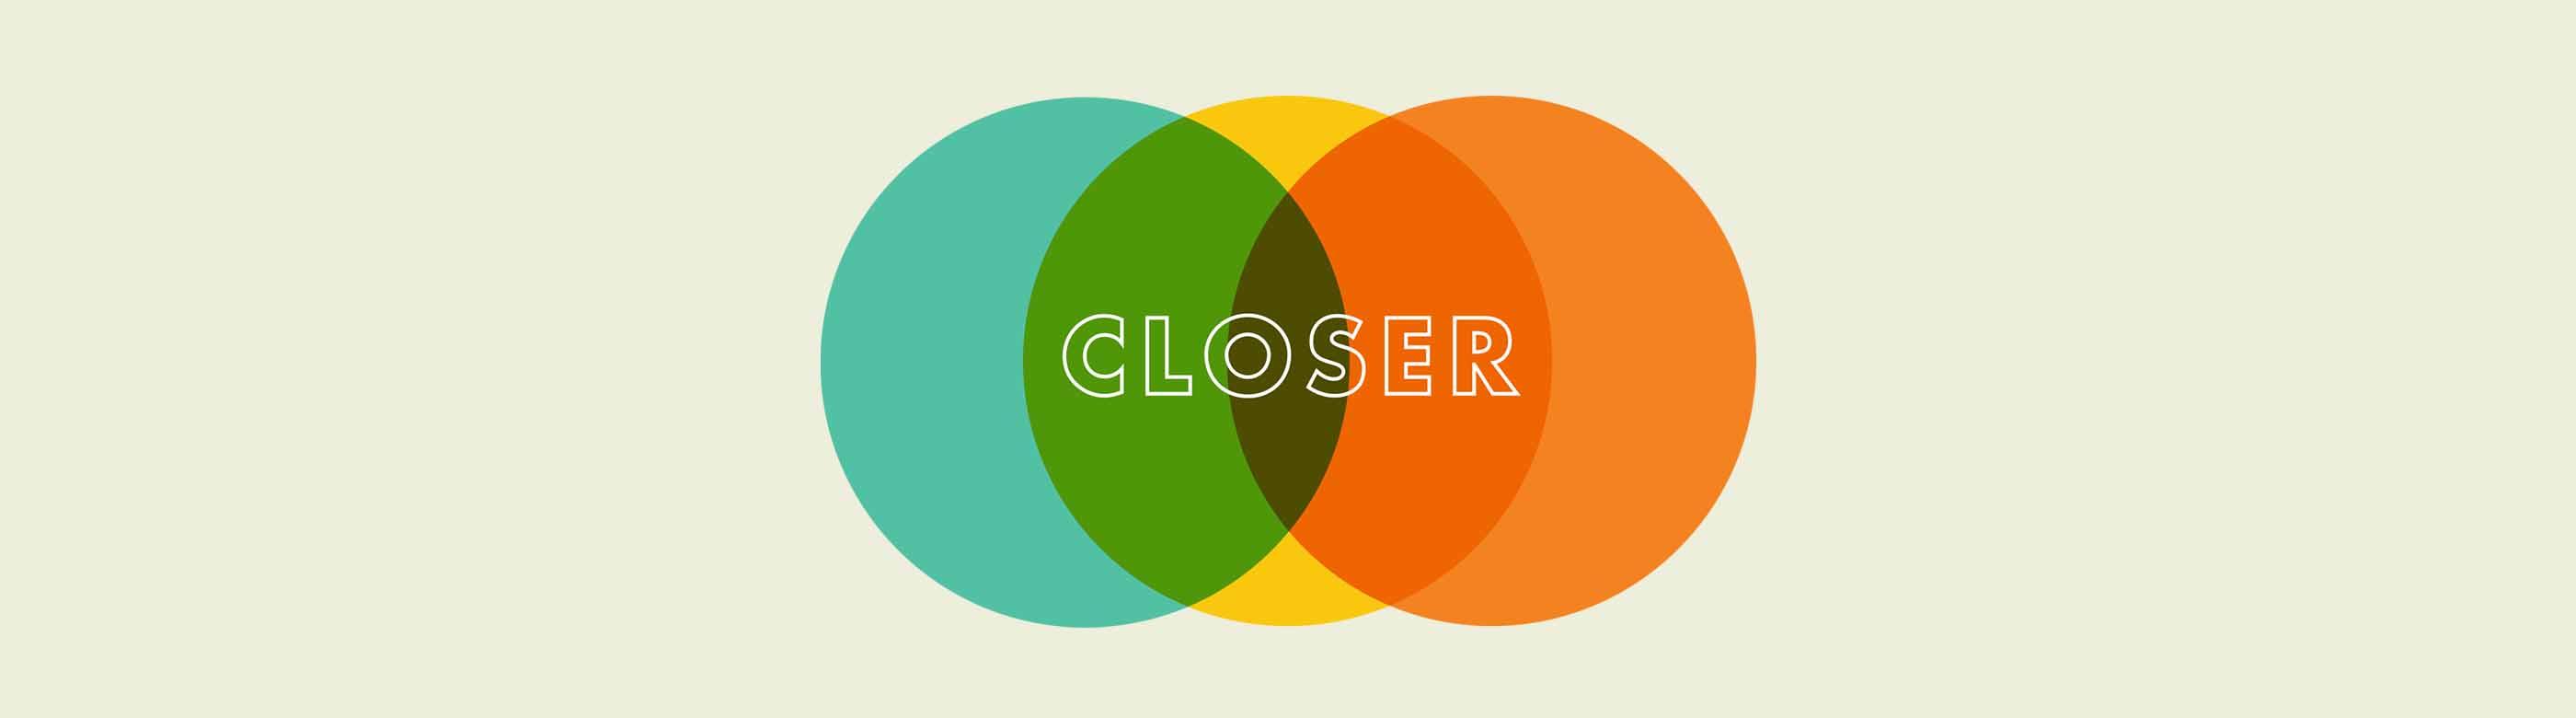 19006-closer